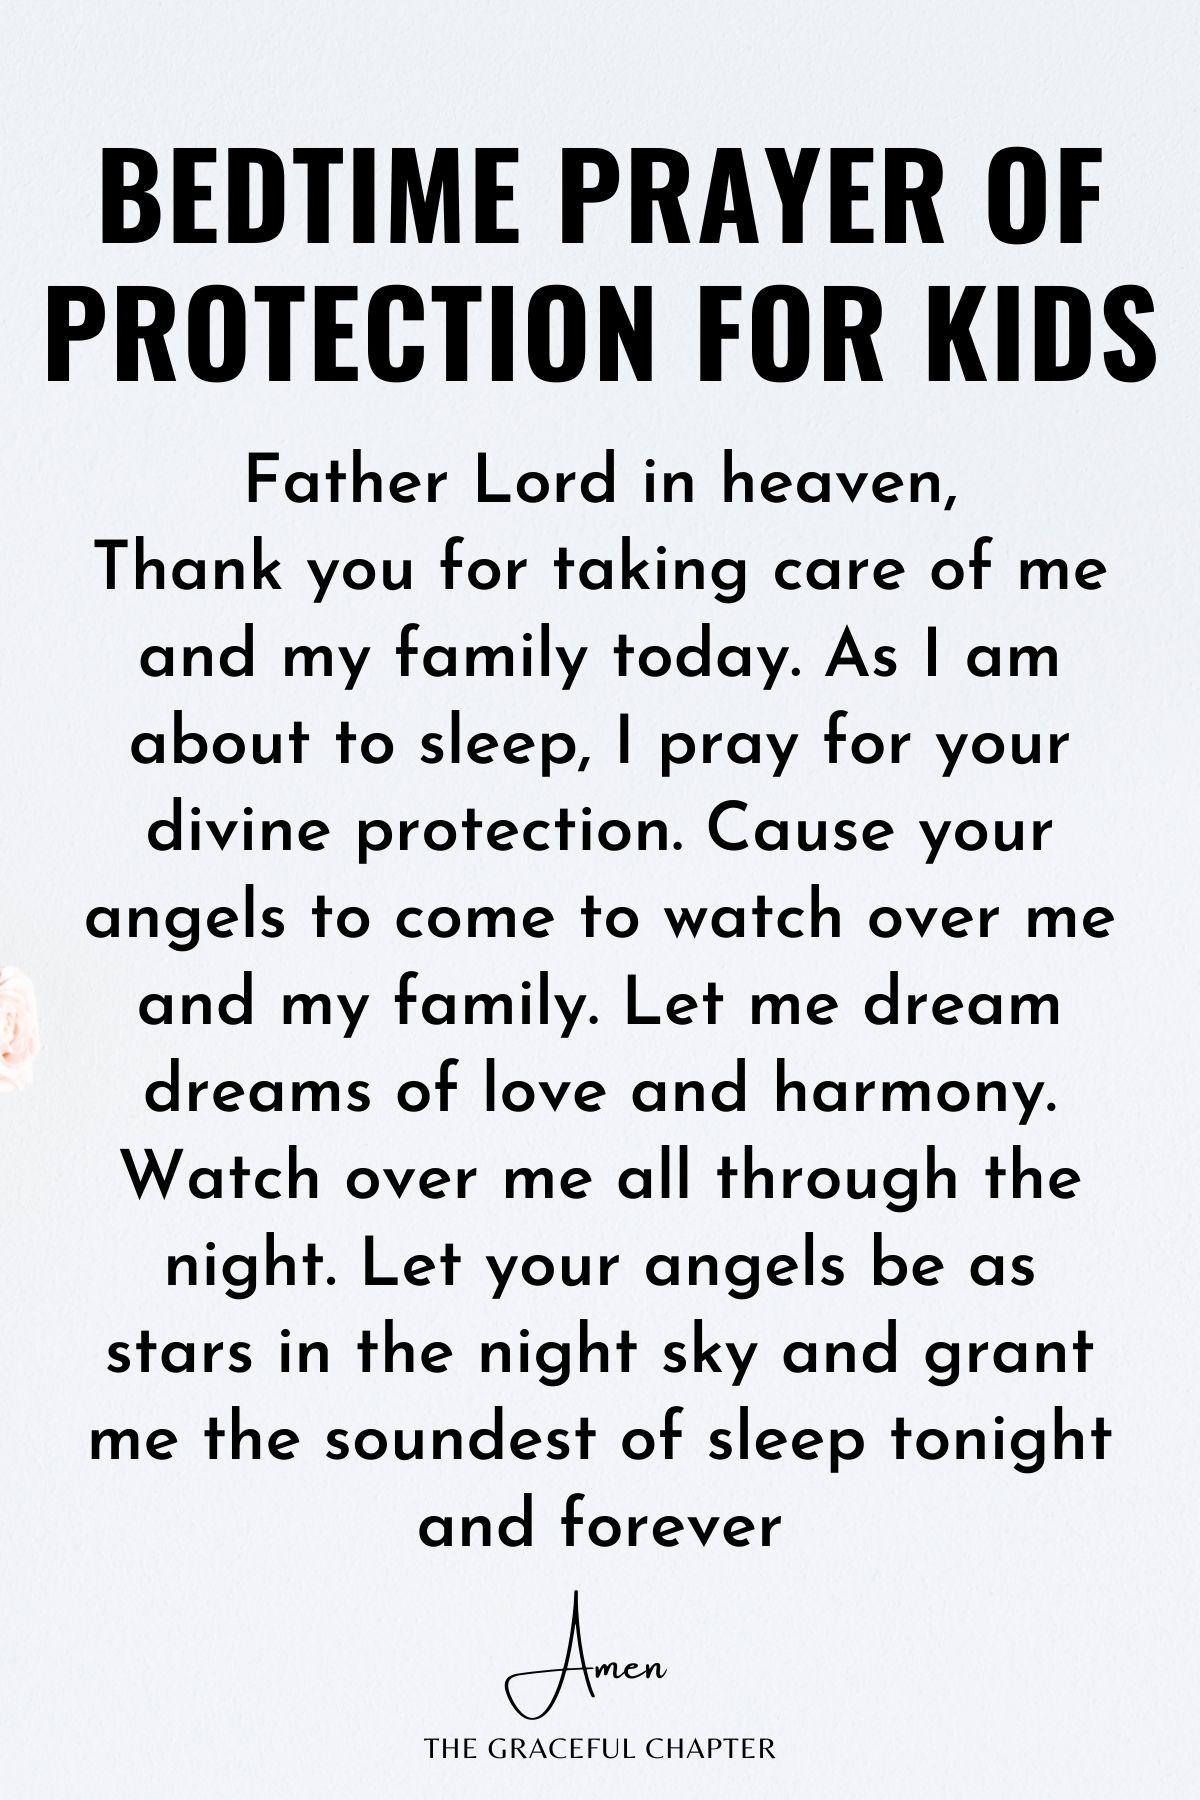 Bedtime prayer of protection for kids